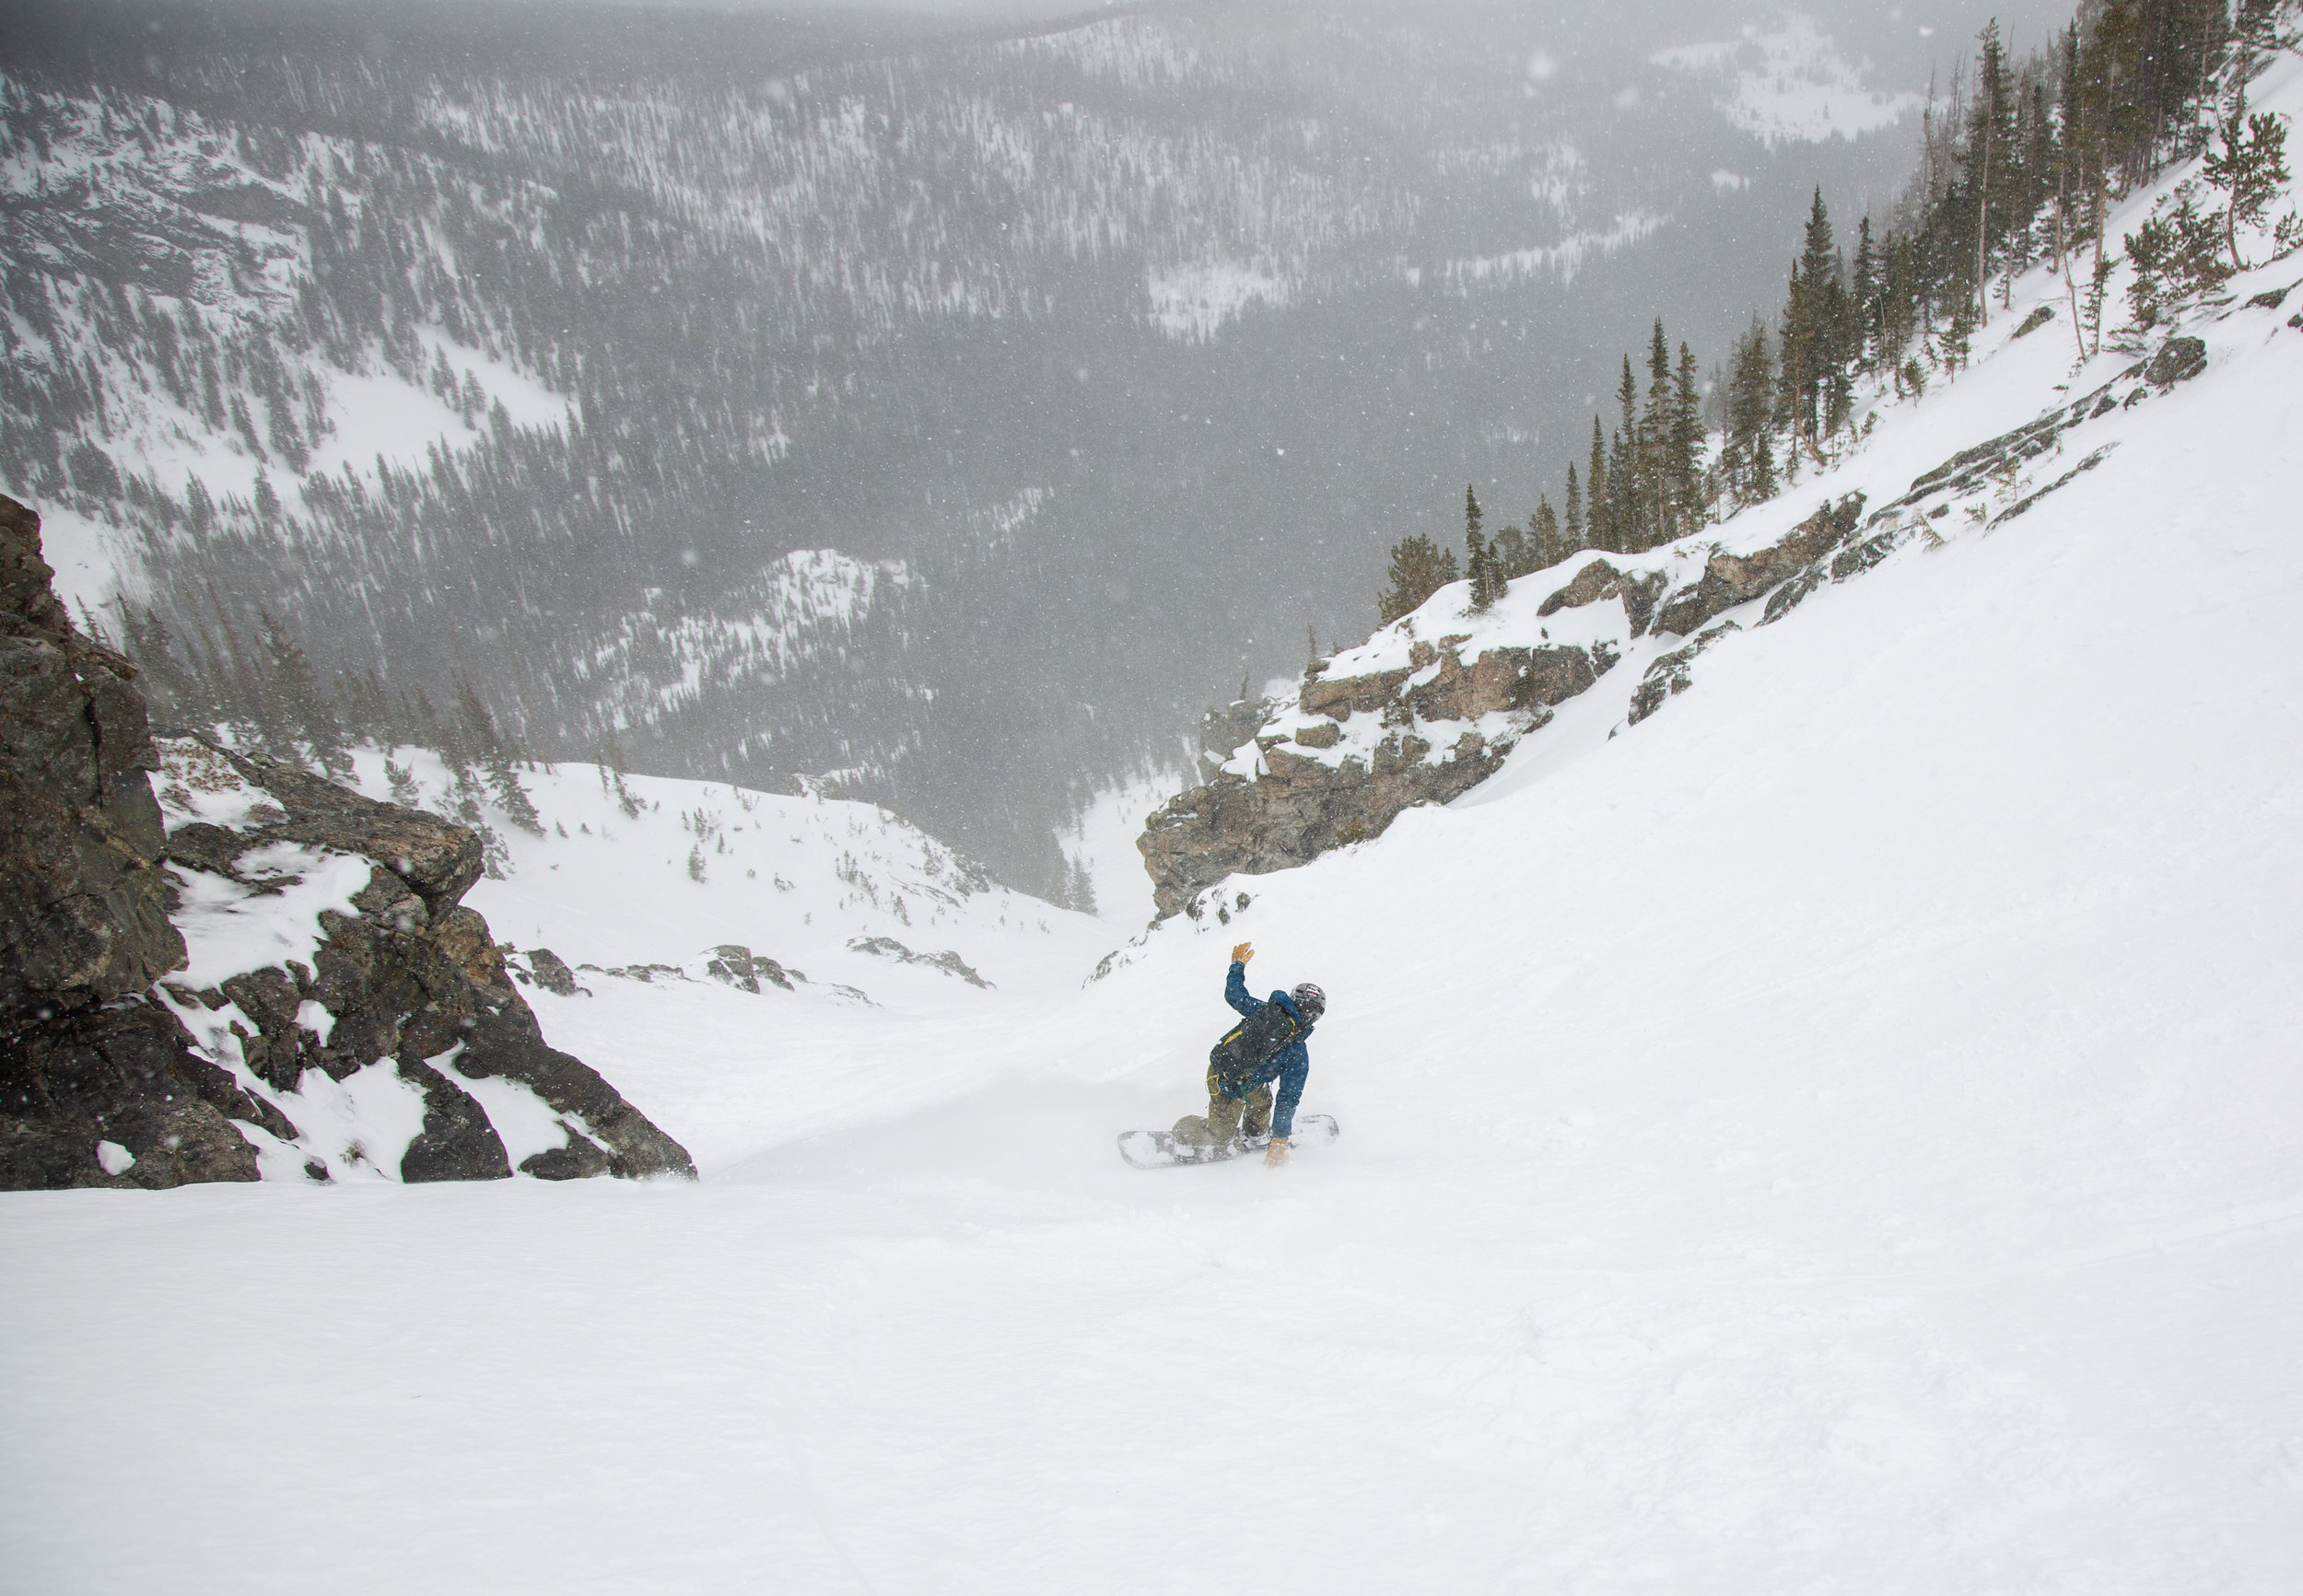 JTG_Skiing-13.jpg